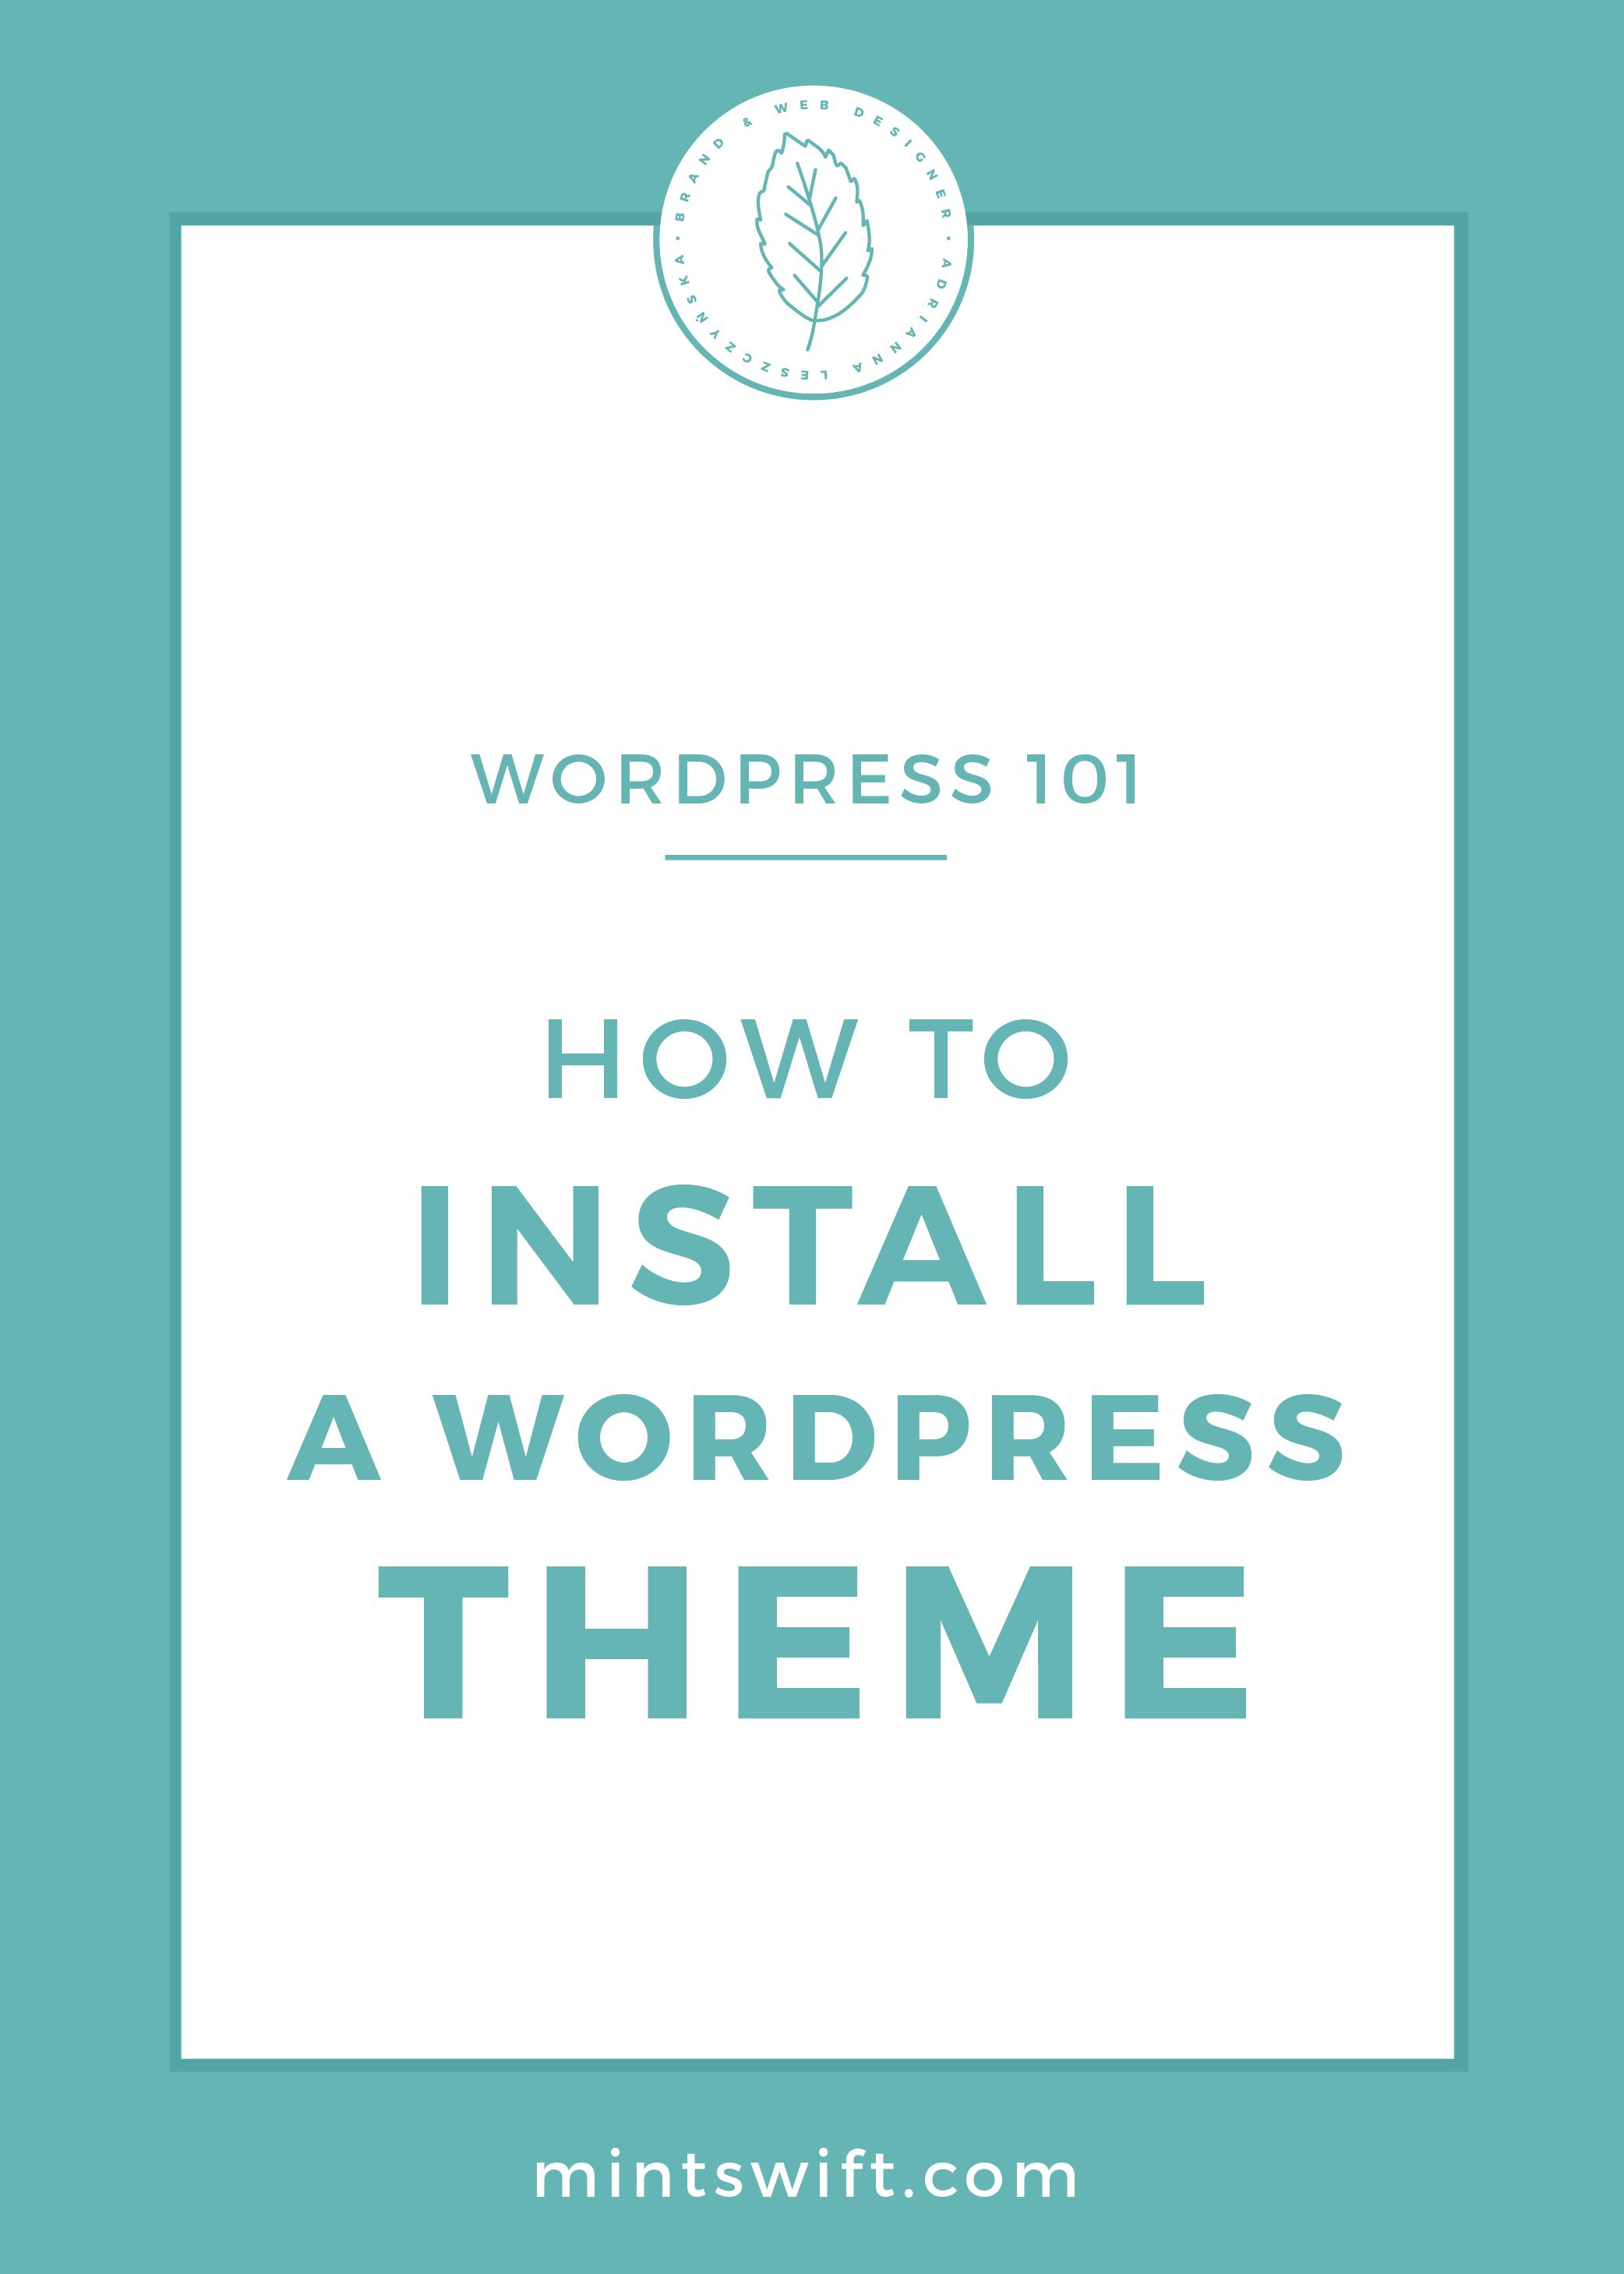 How to Install a WordPress Theme by MintSwift